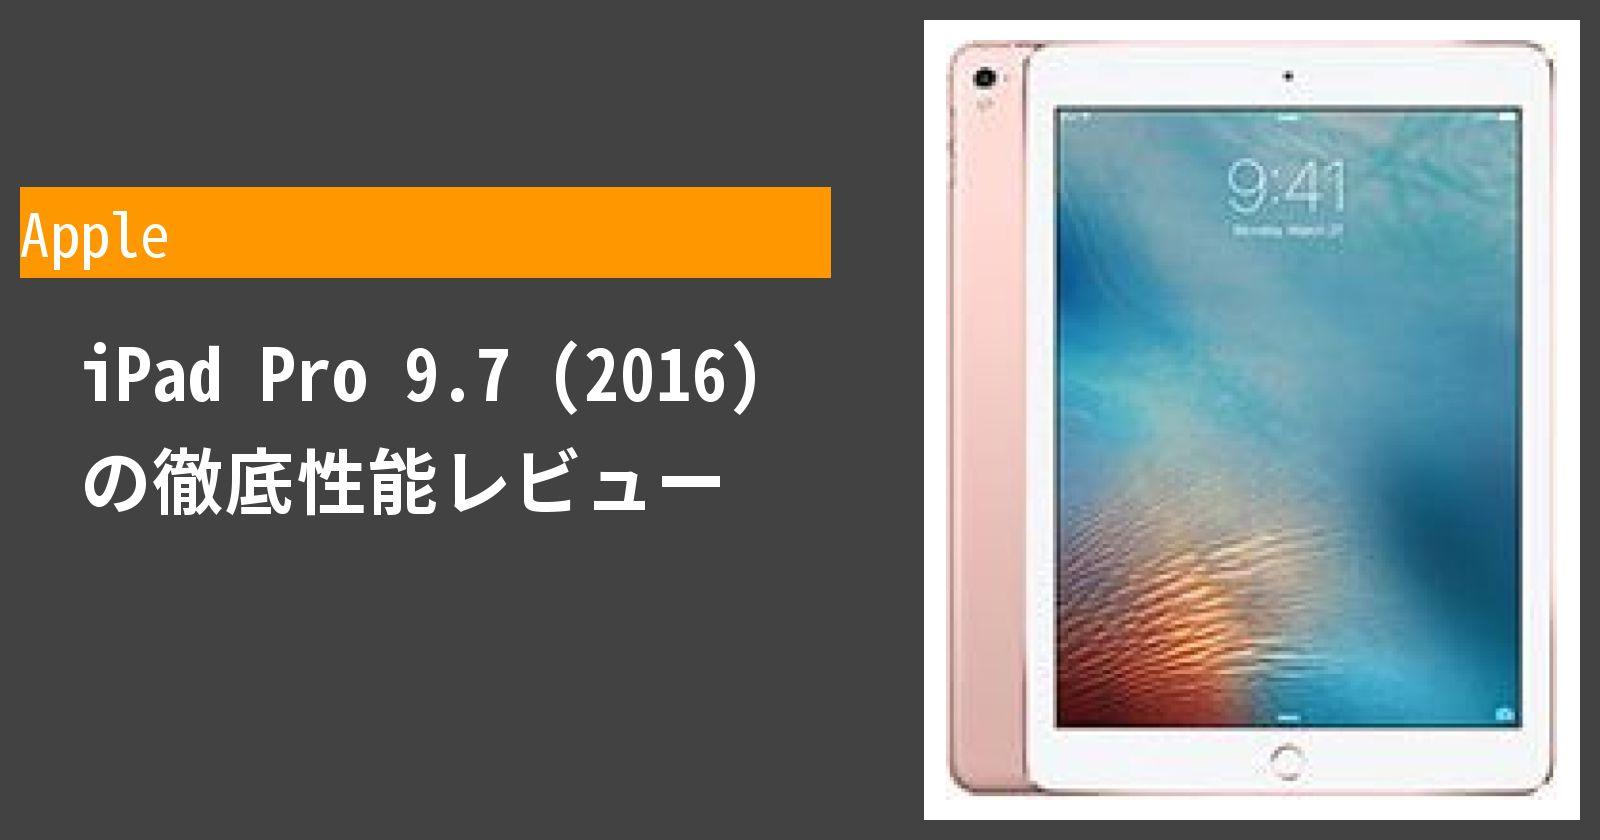 iPad Pro 9.7 (2016) の徹底性能レビュー